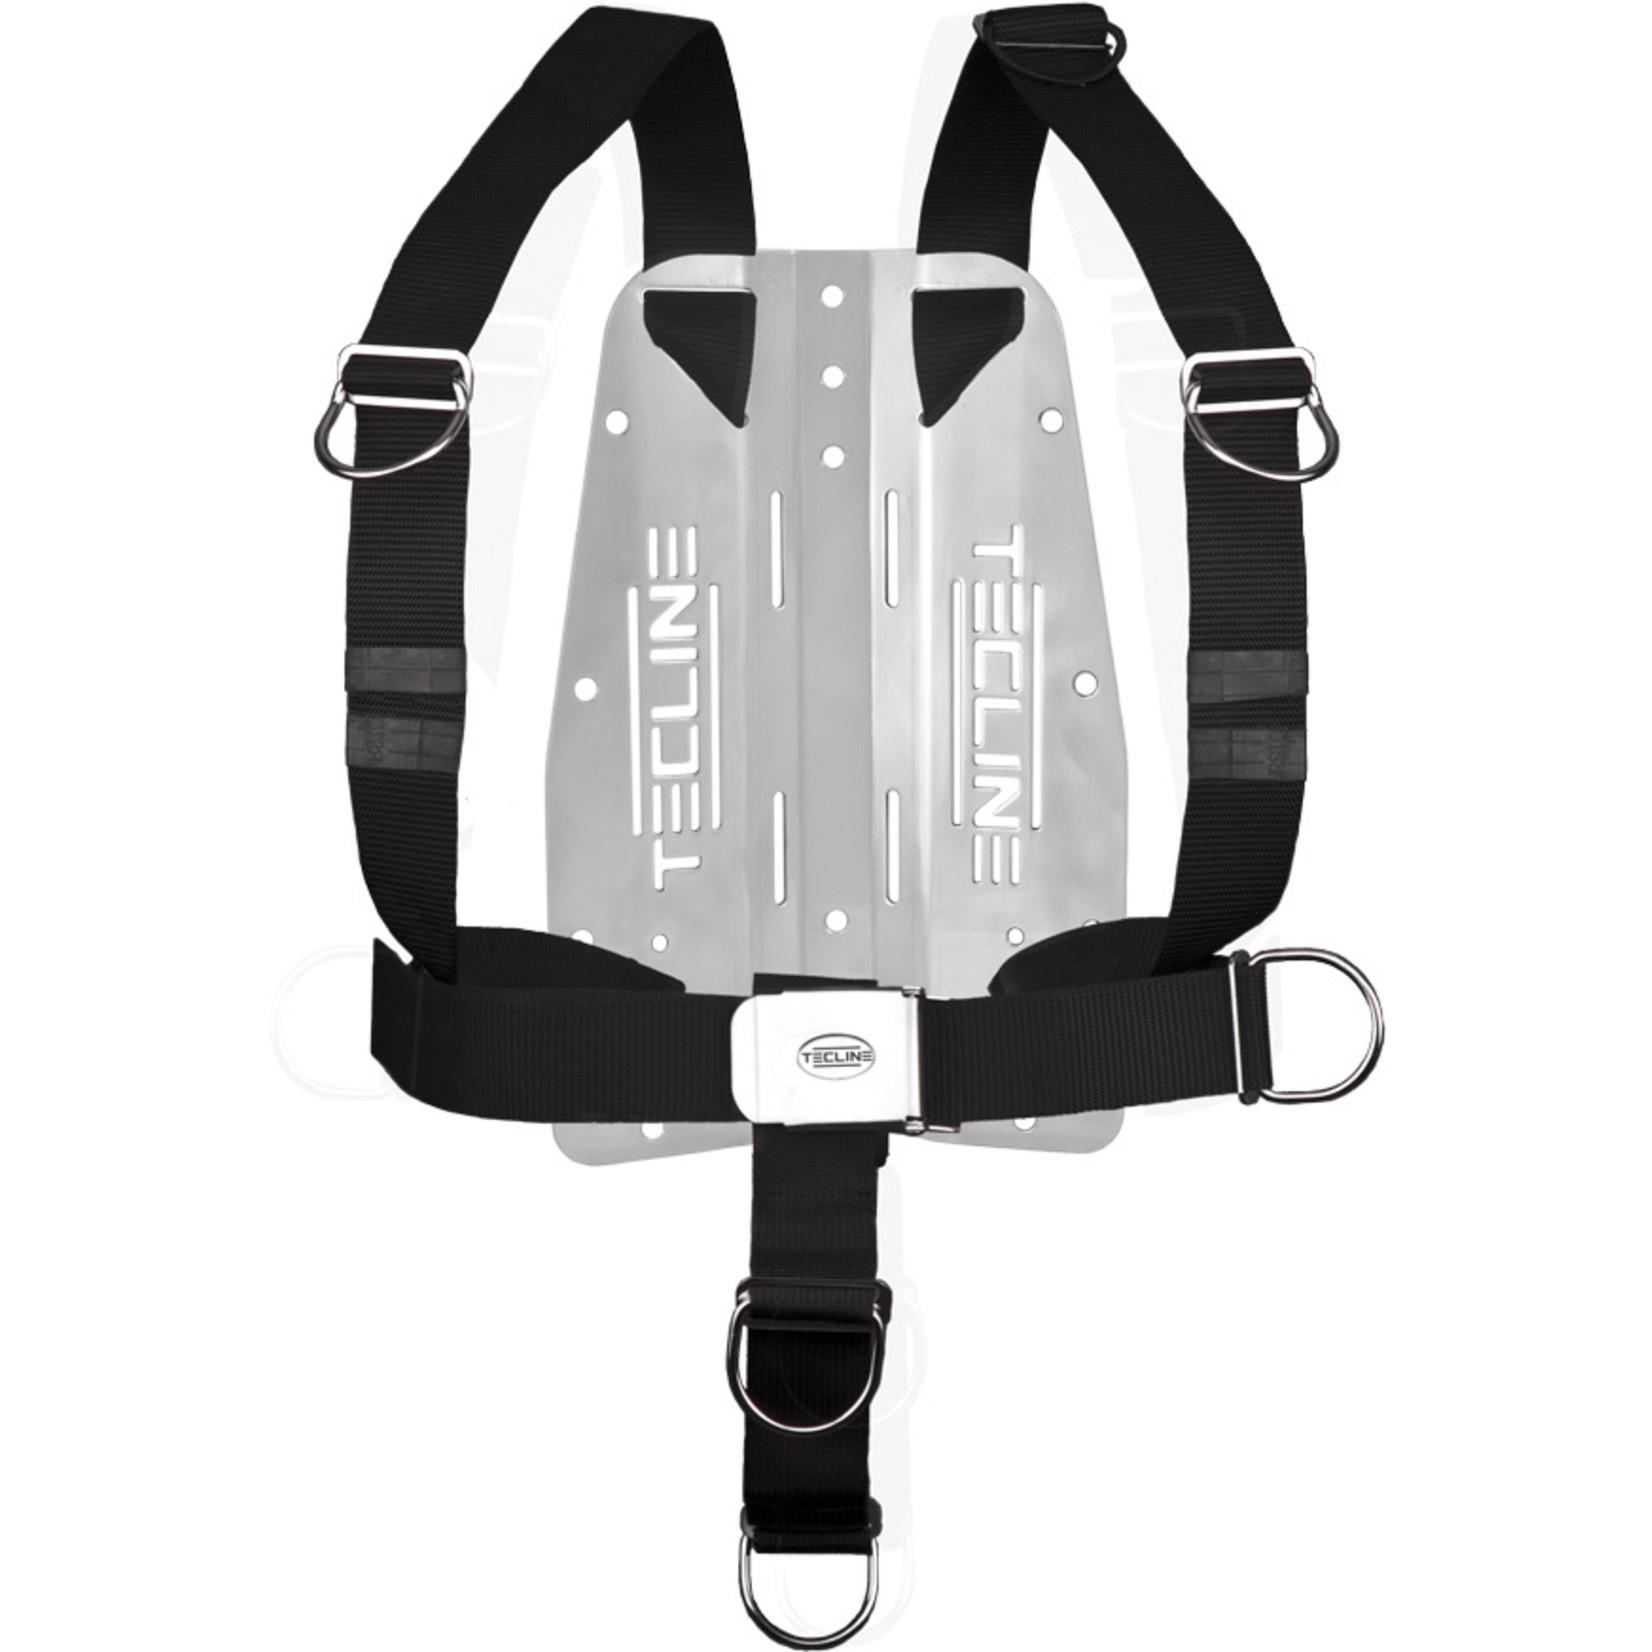 Tecline Harness TecLine DIR standard webbing - incl. 3mm RVS backplate, fixed D-rings